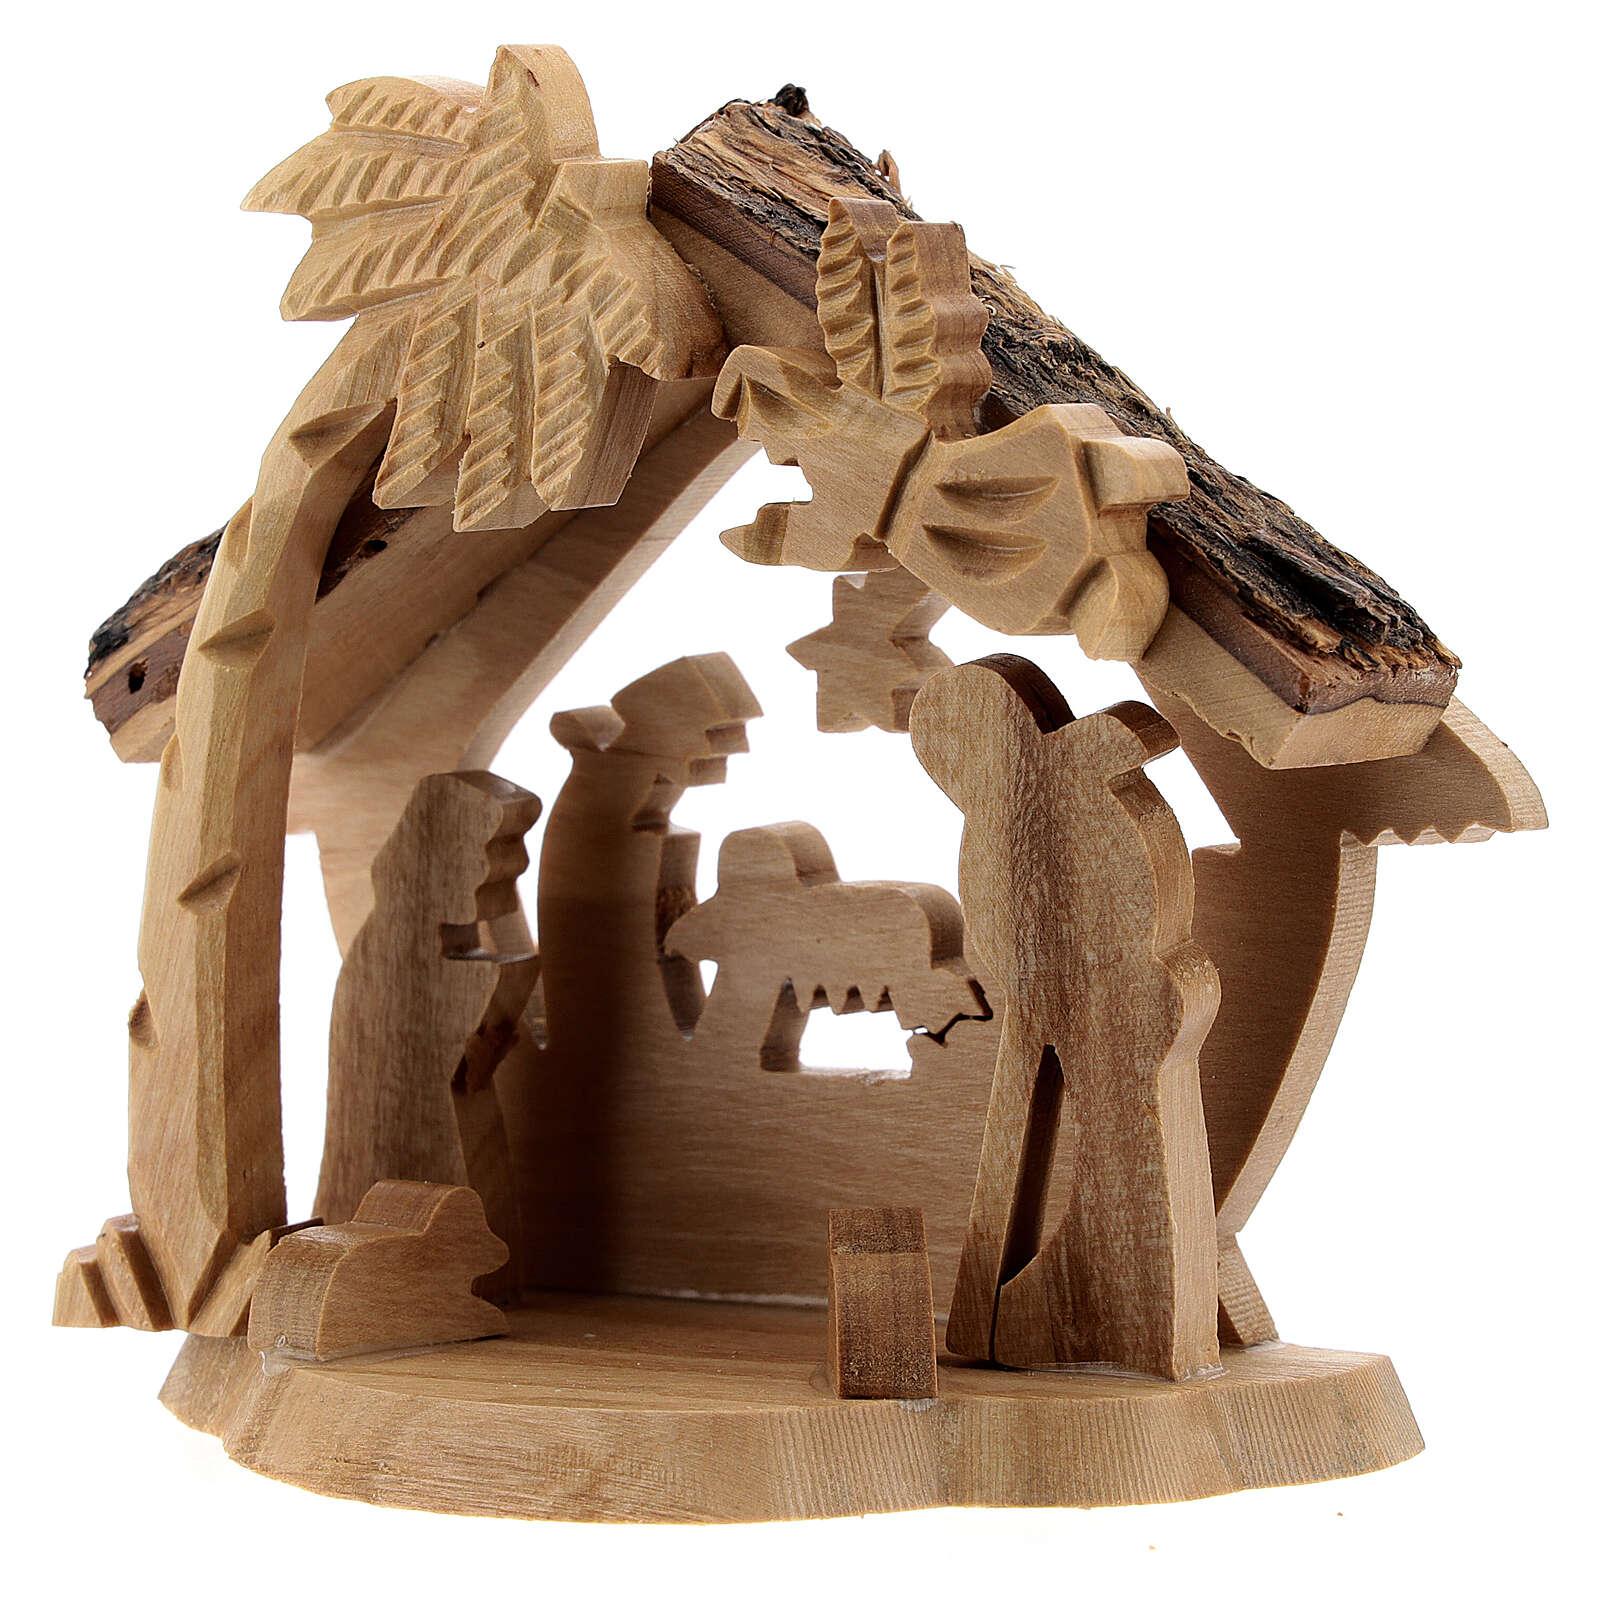 Krippenhütte aus Olivenholz Stil Bethlehem mit Palme, 10x10x5 cm 4